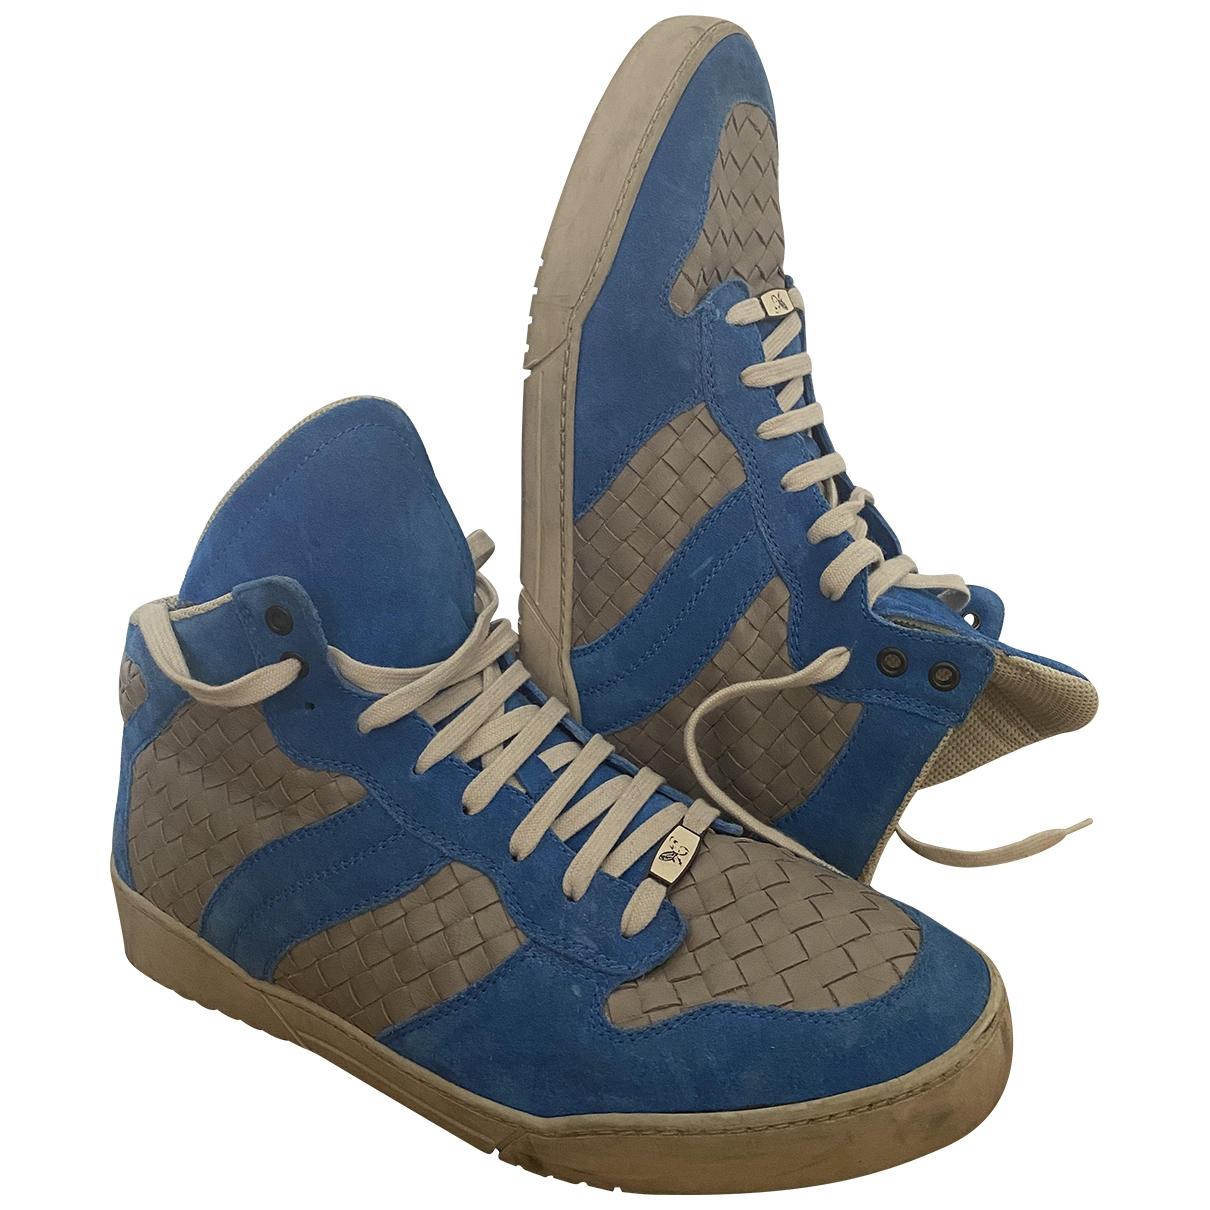 Bottega Veneta - Baskets   pour homme en cuir - bleu